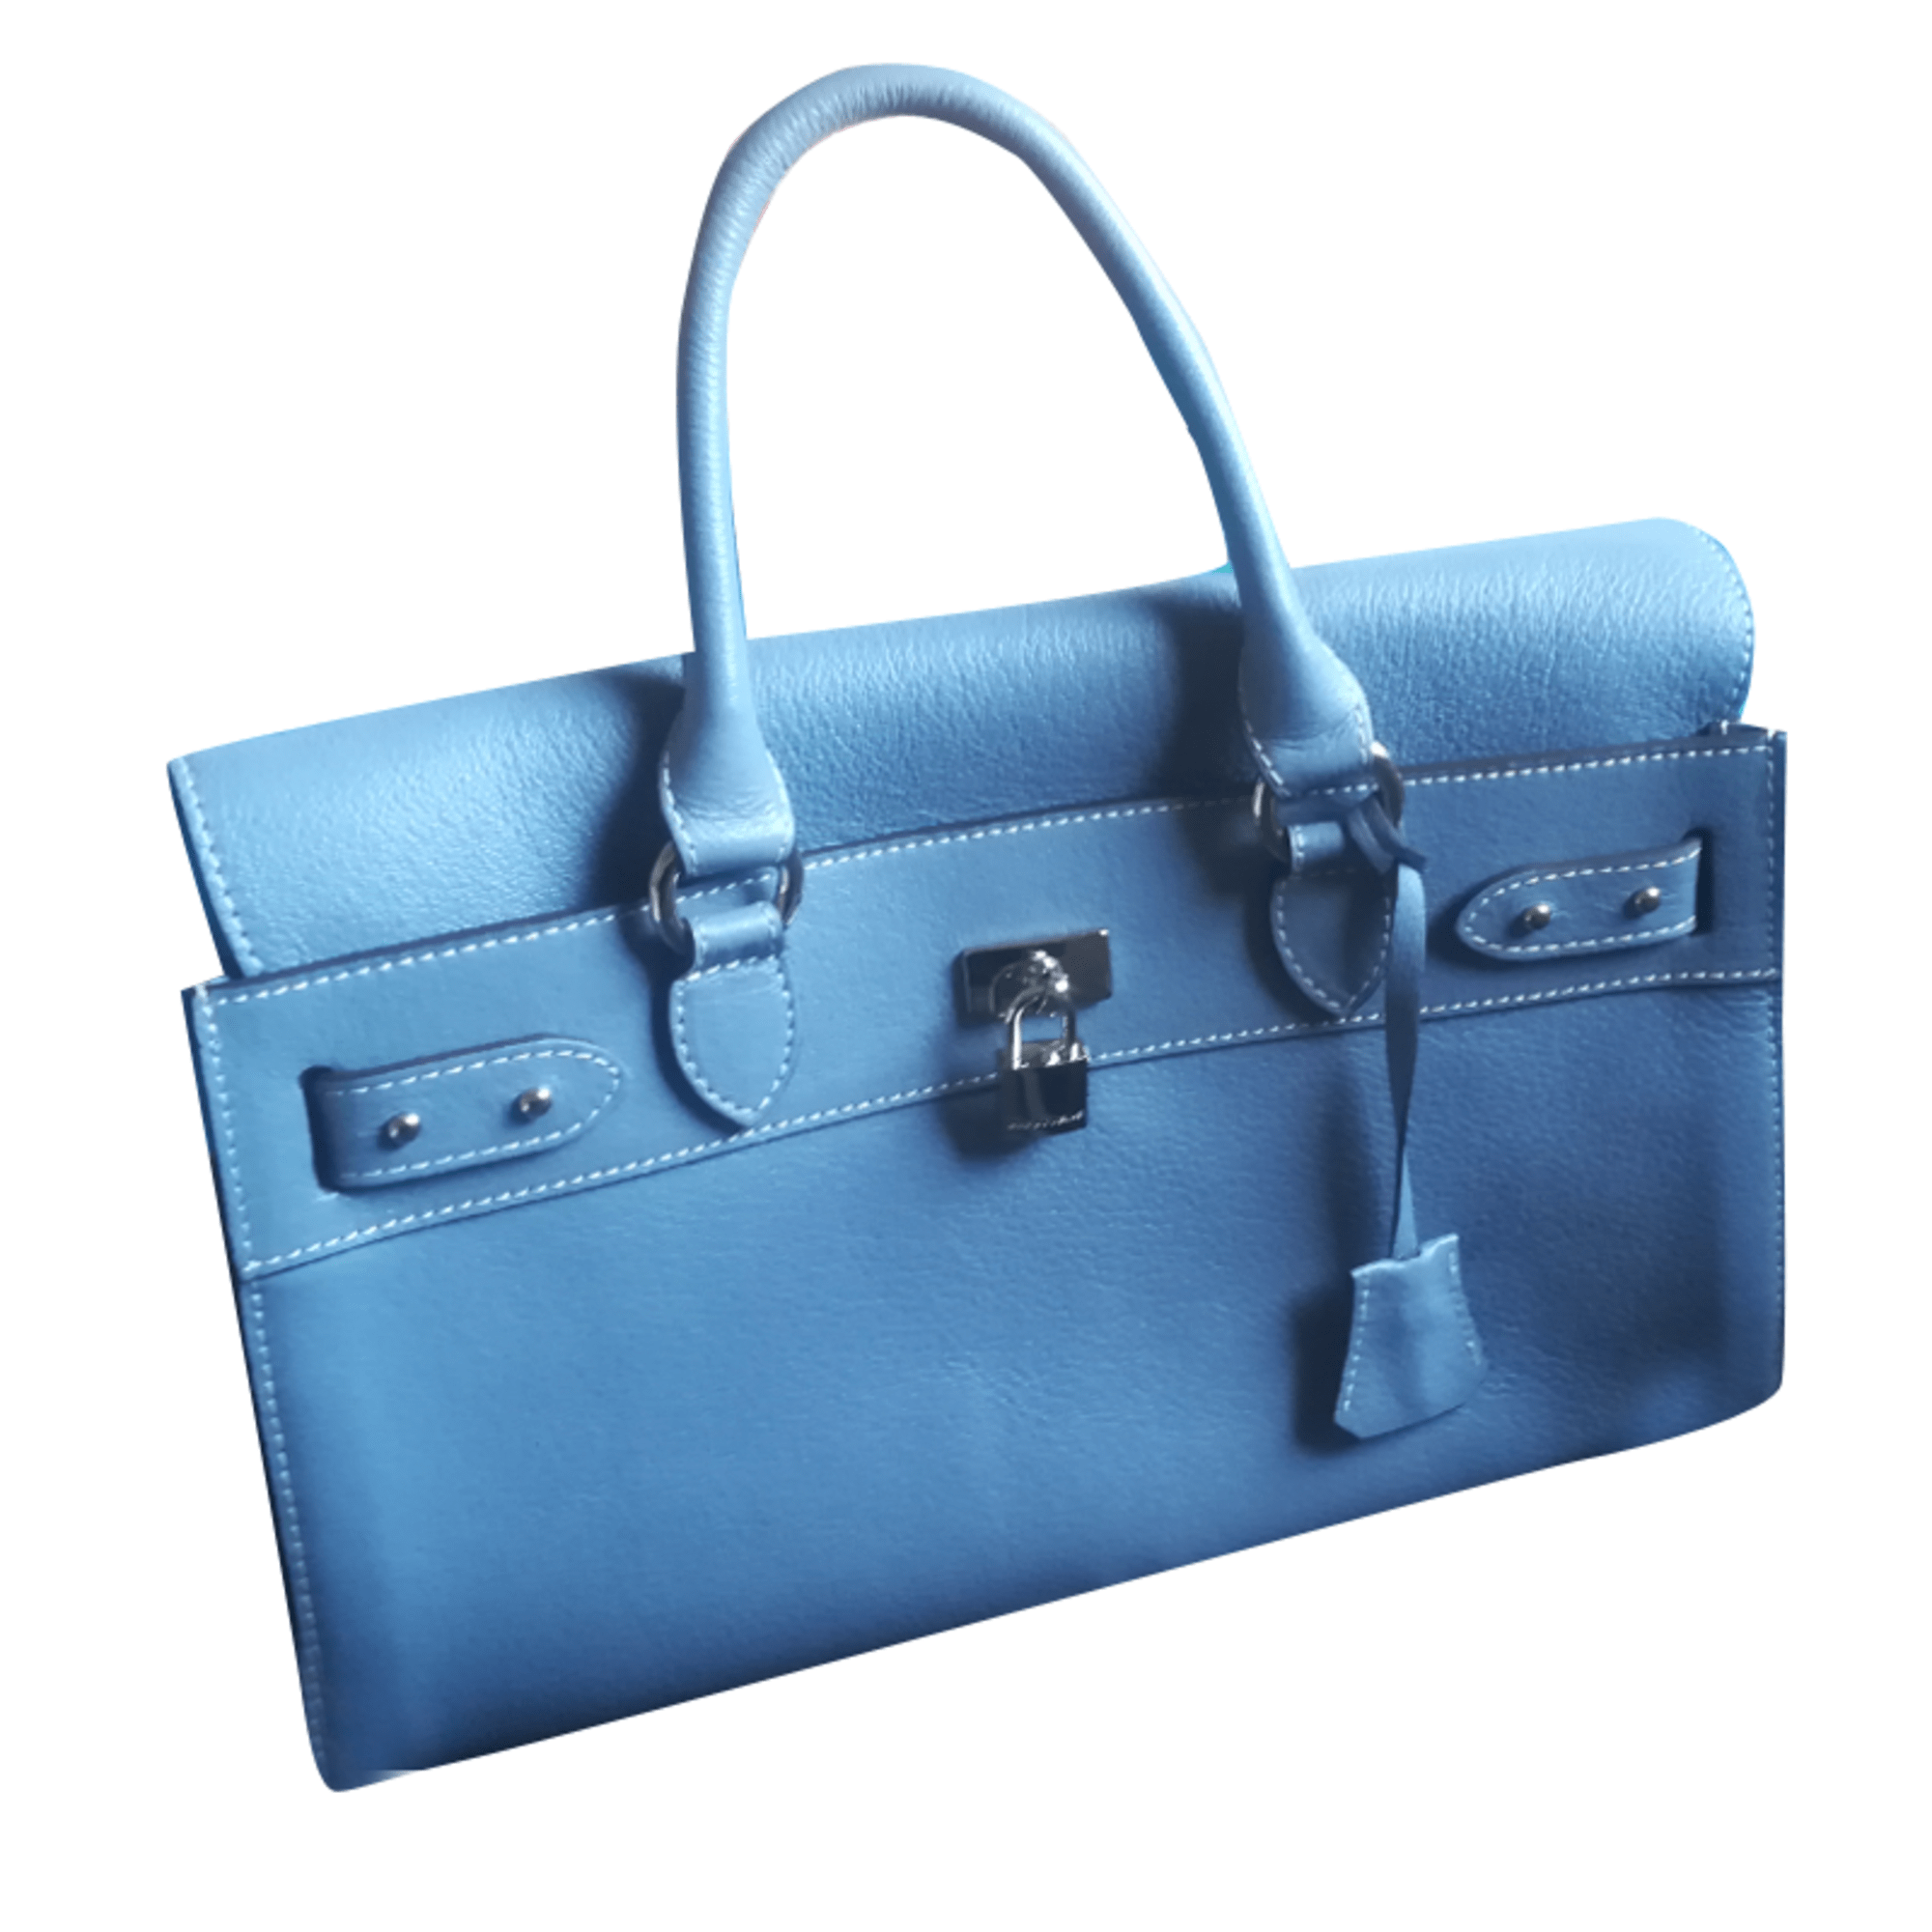 sac mac douglas d'occasion bleu turquoise